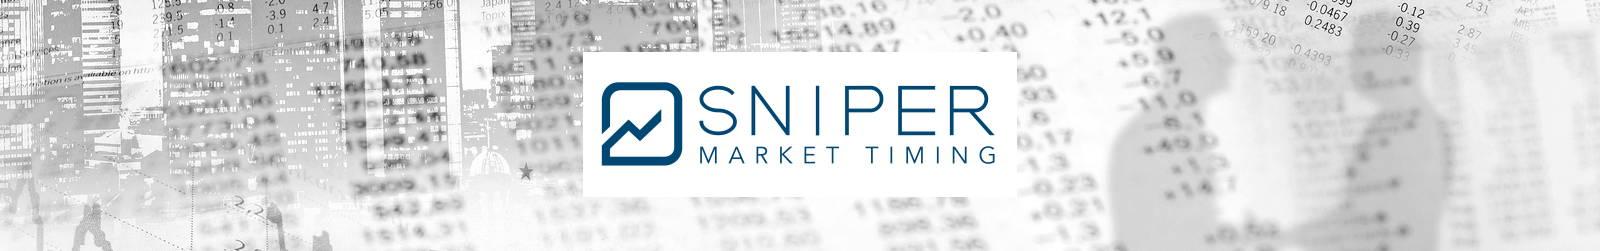 Sniper Market Timing Newsletter